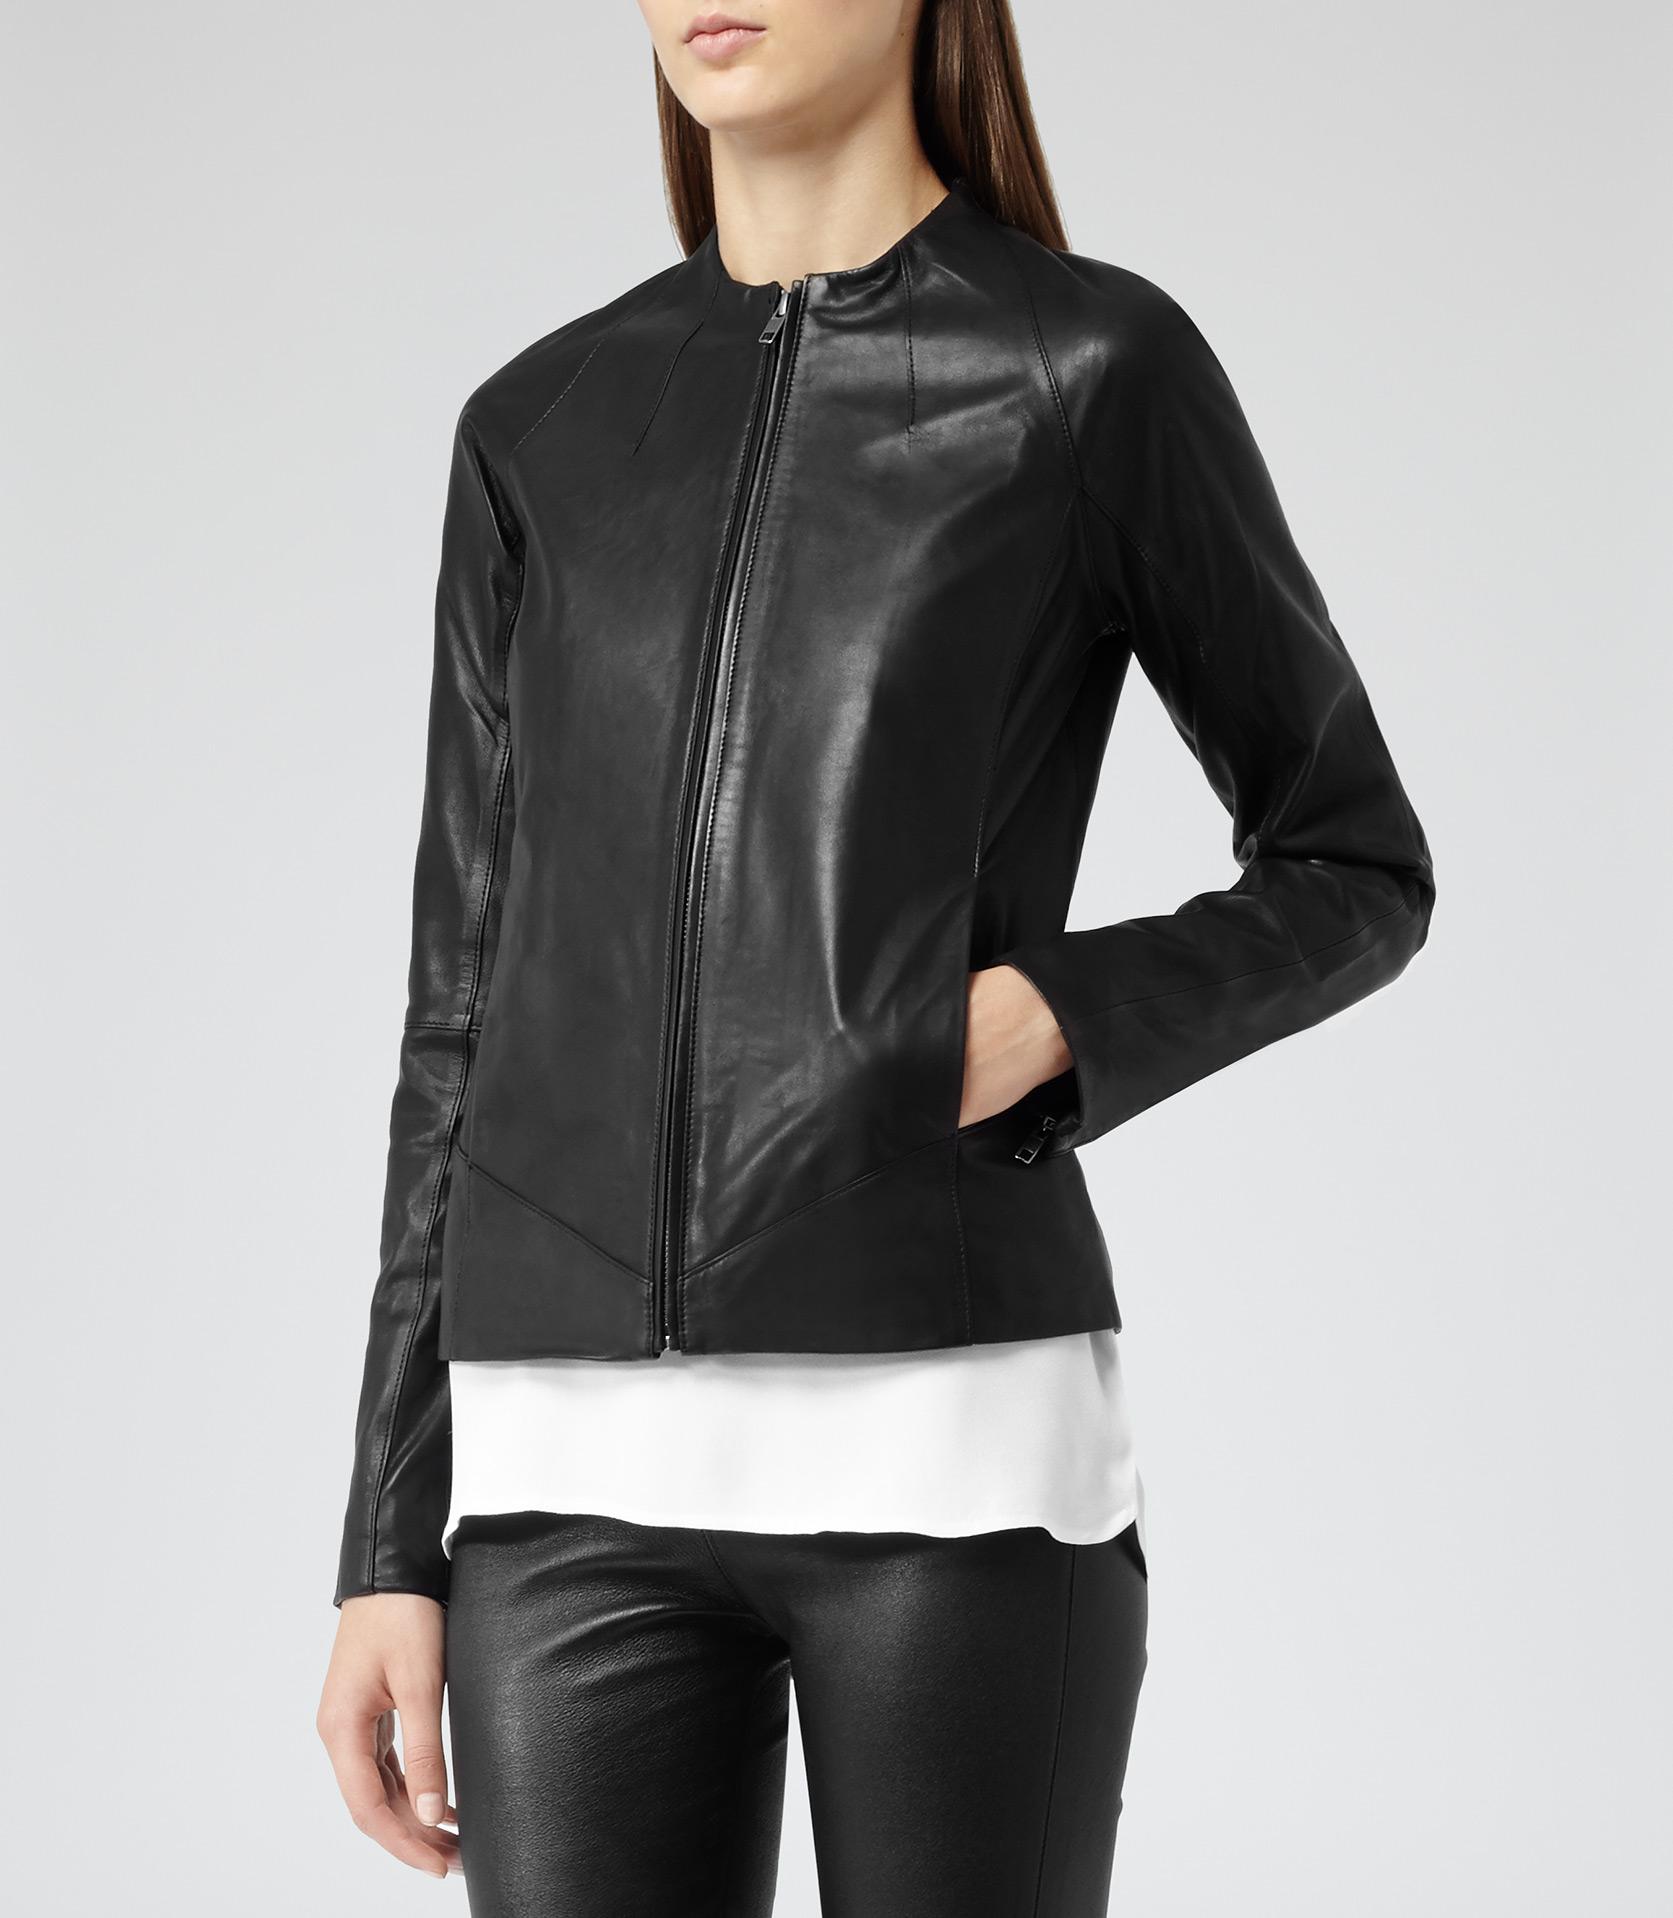 08fc8edfdaff Reiss Kinney Zip Through Leather Jacket in Black - Lyst